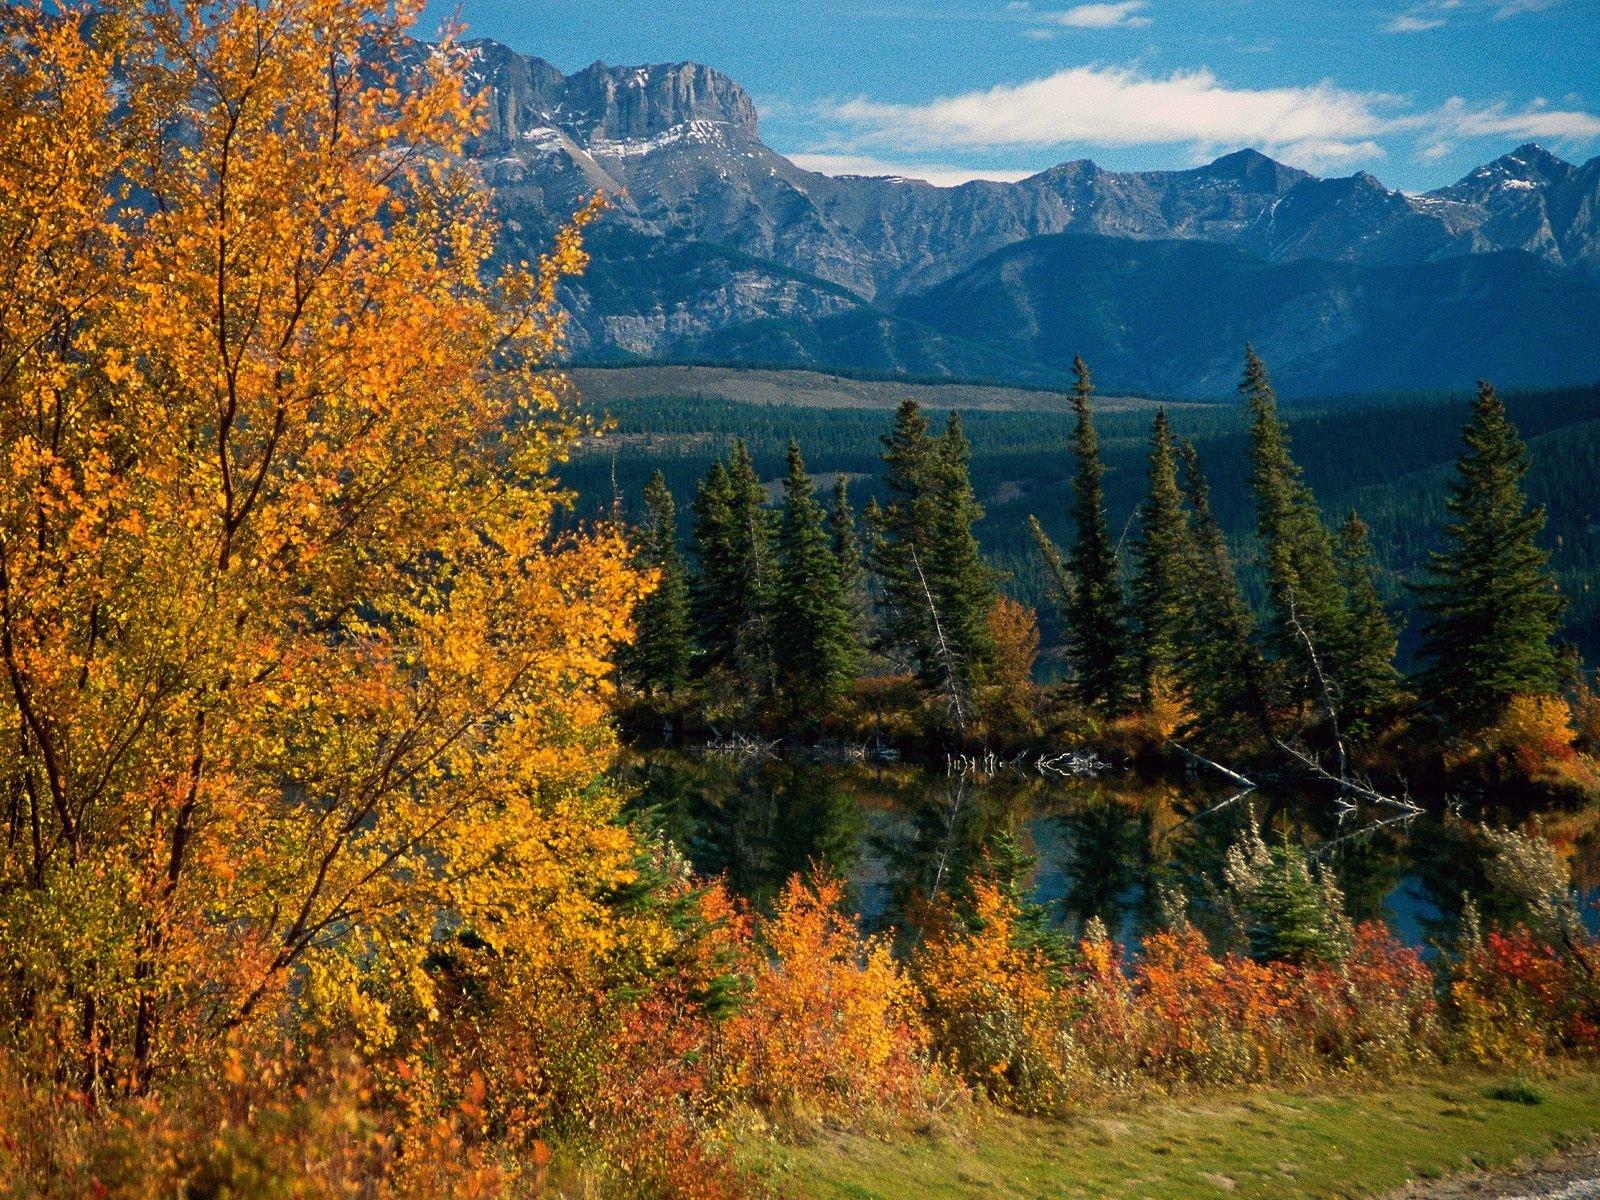 Alberta Canada postcard Jasper National Park Alberta Canada wallpaper 1600x1200